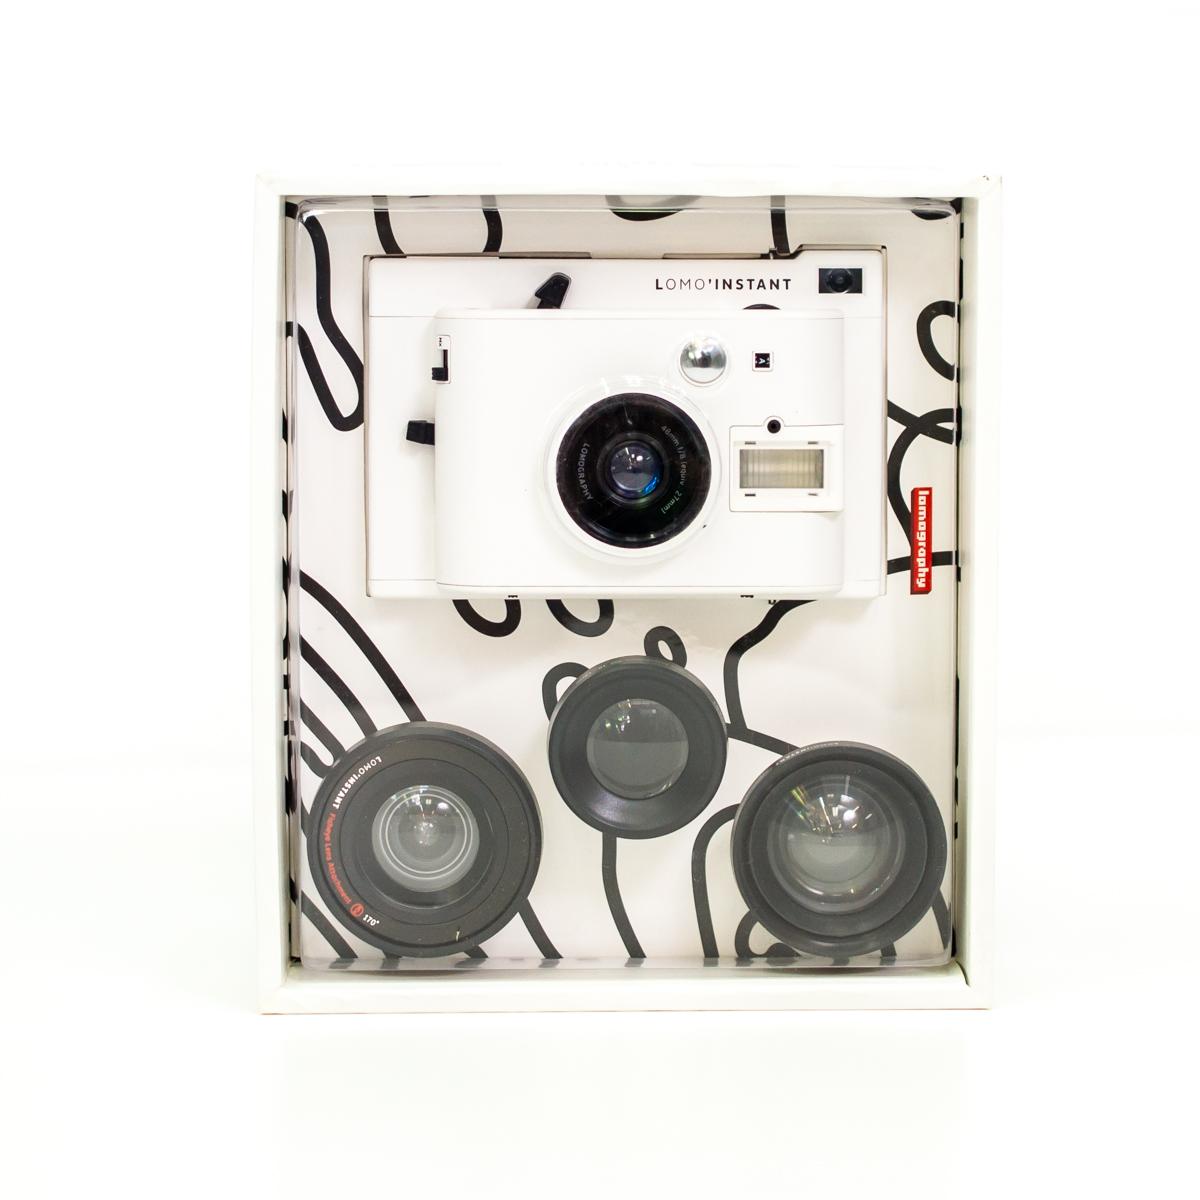 Lomography - Lomo' Instant + 3 lens